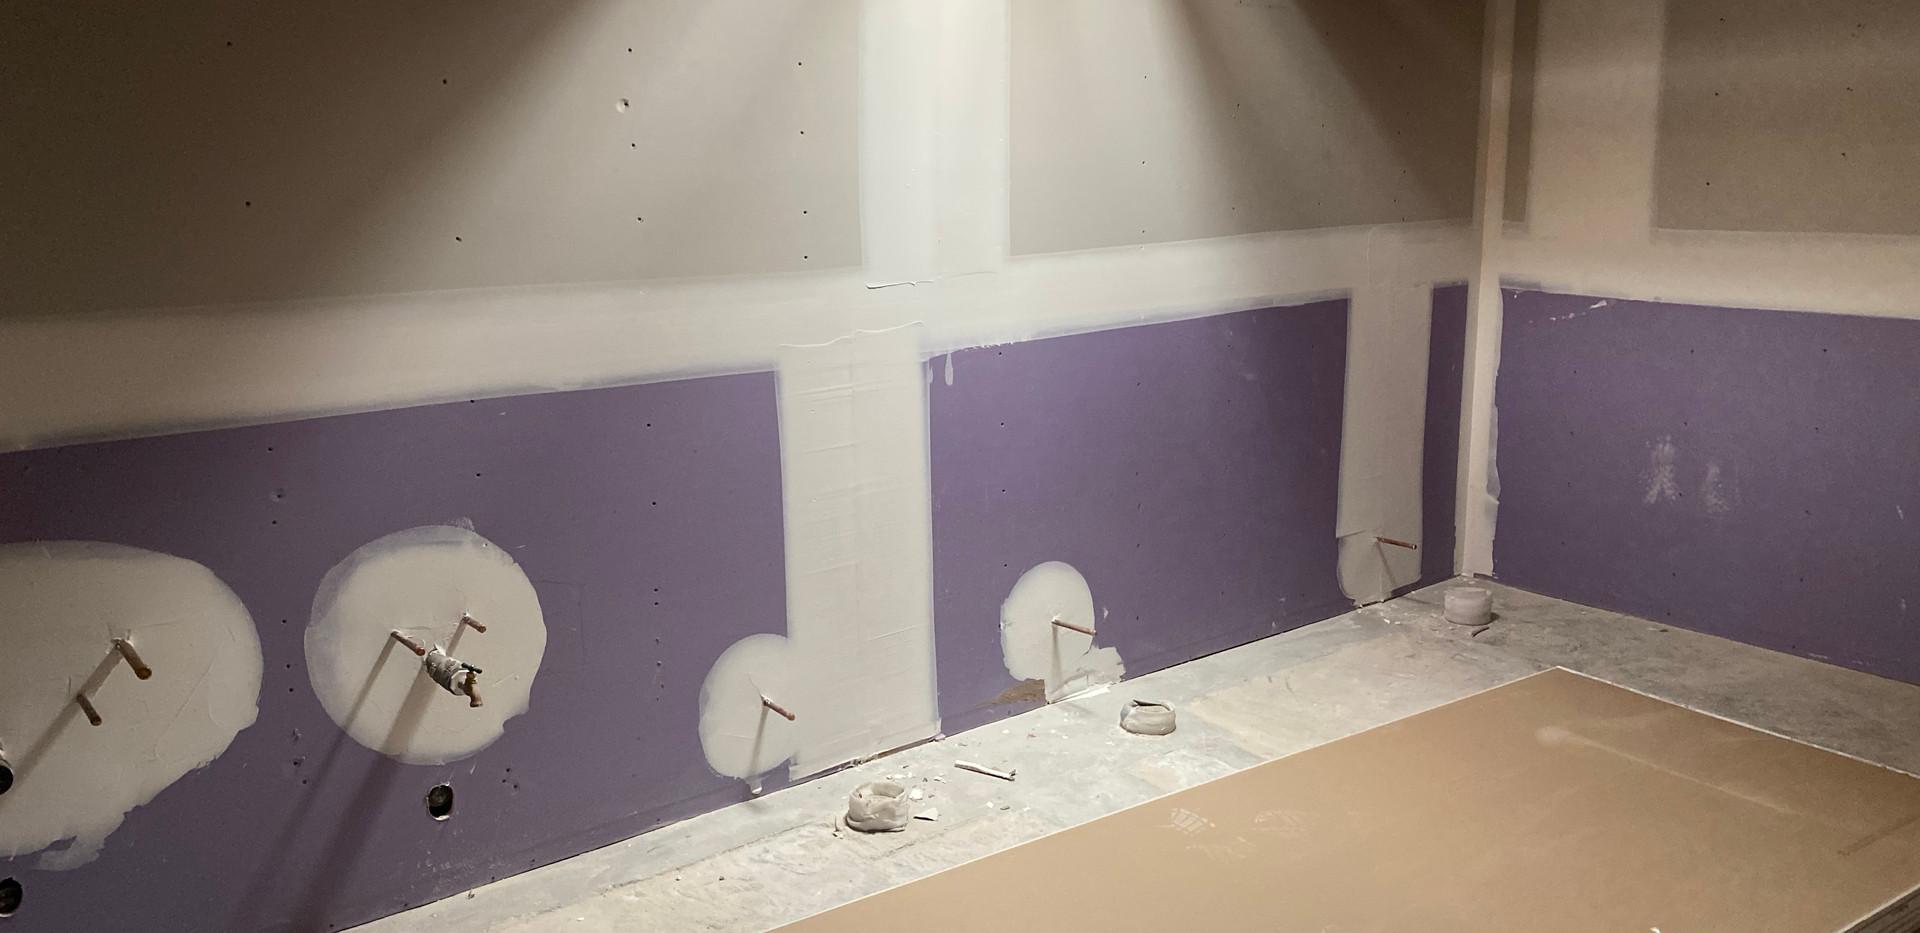 WomensBathroom.jpg